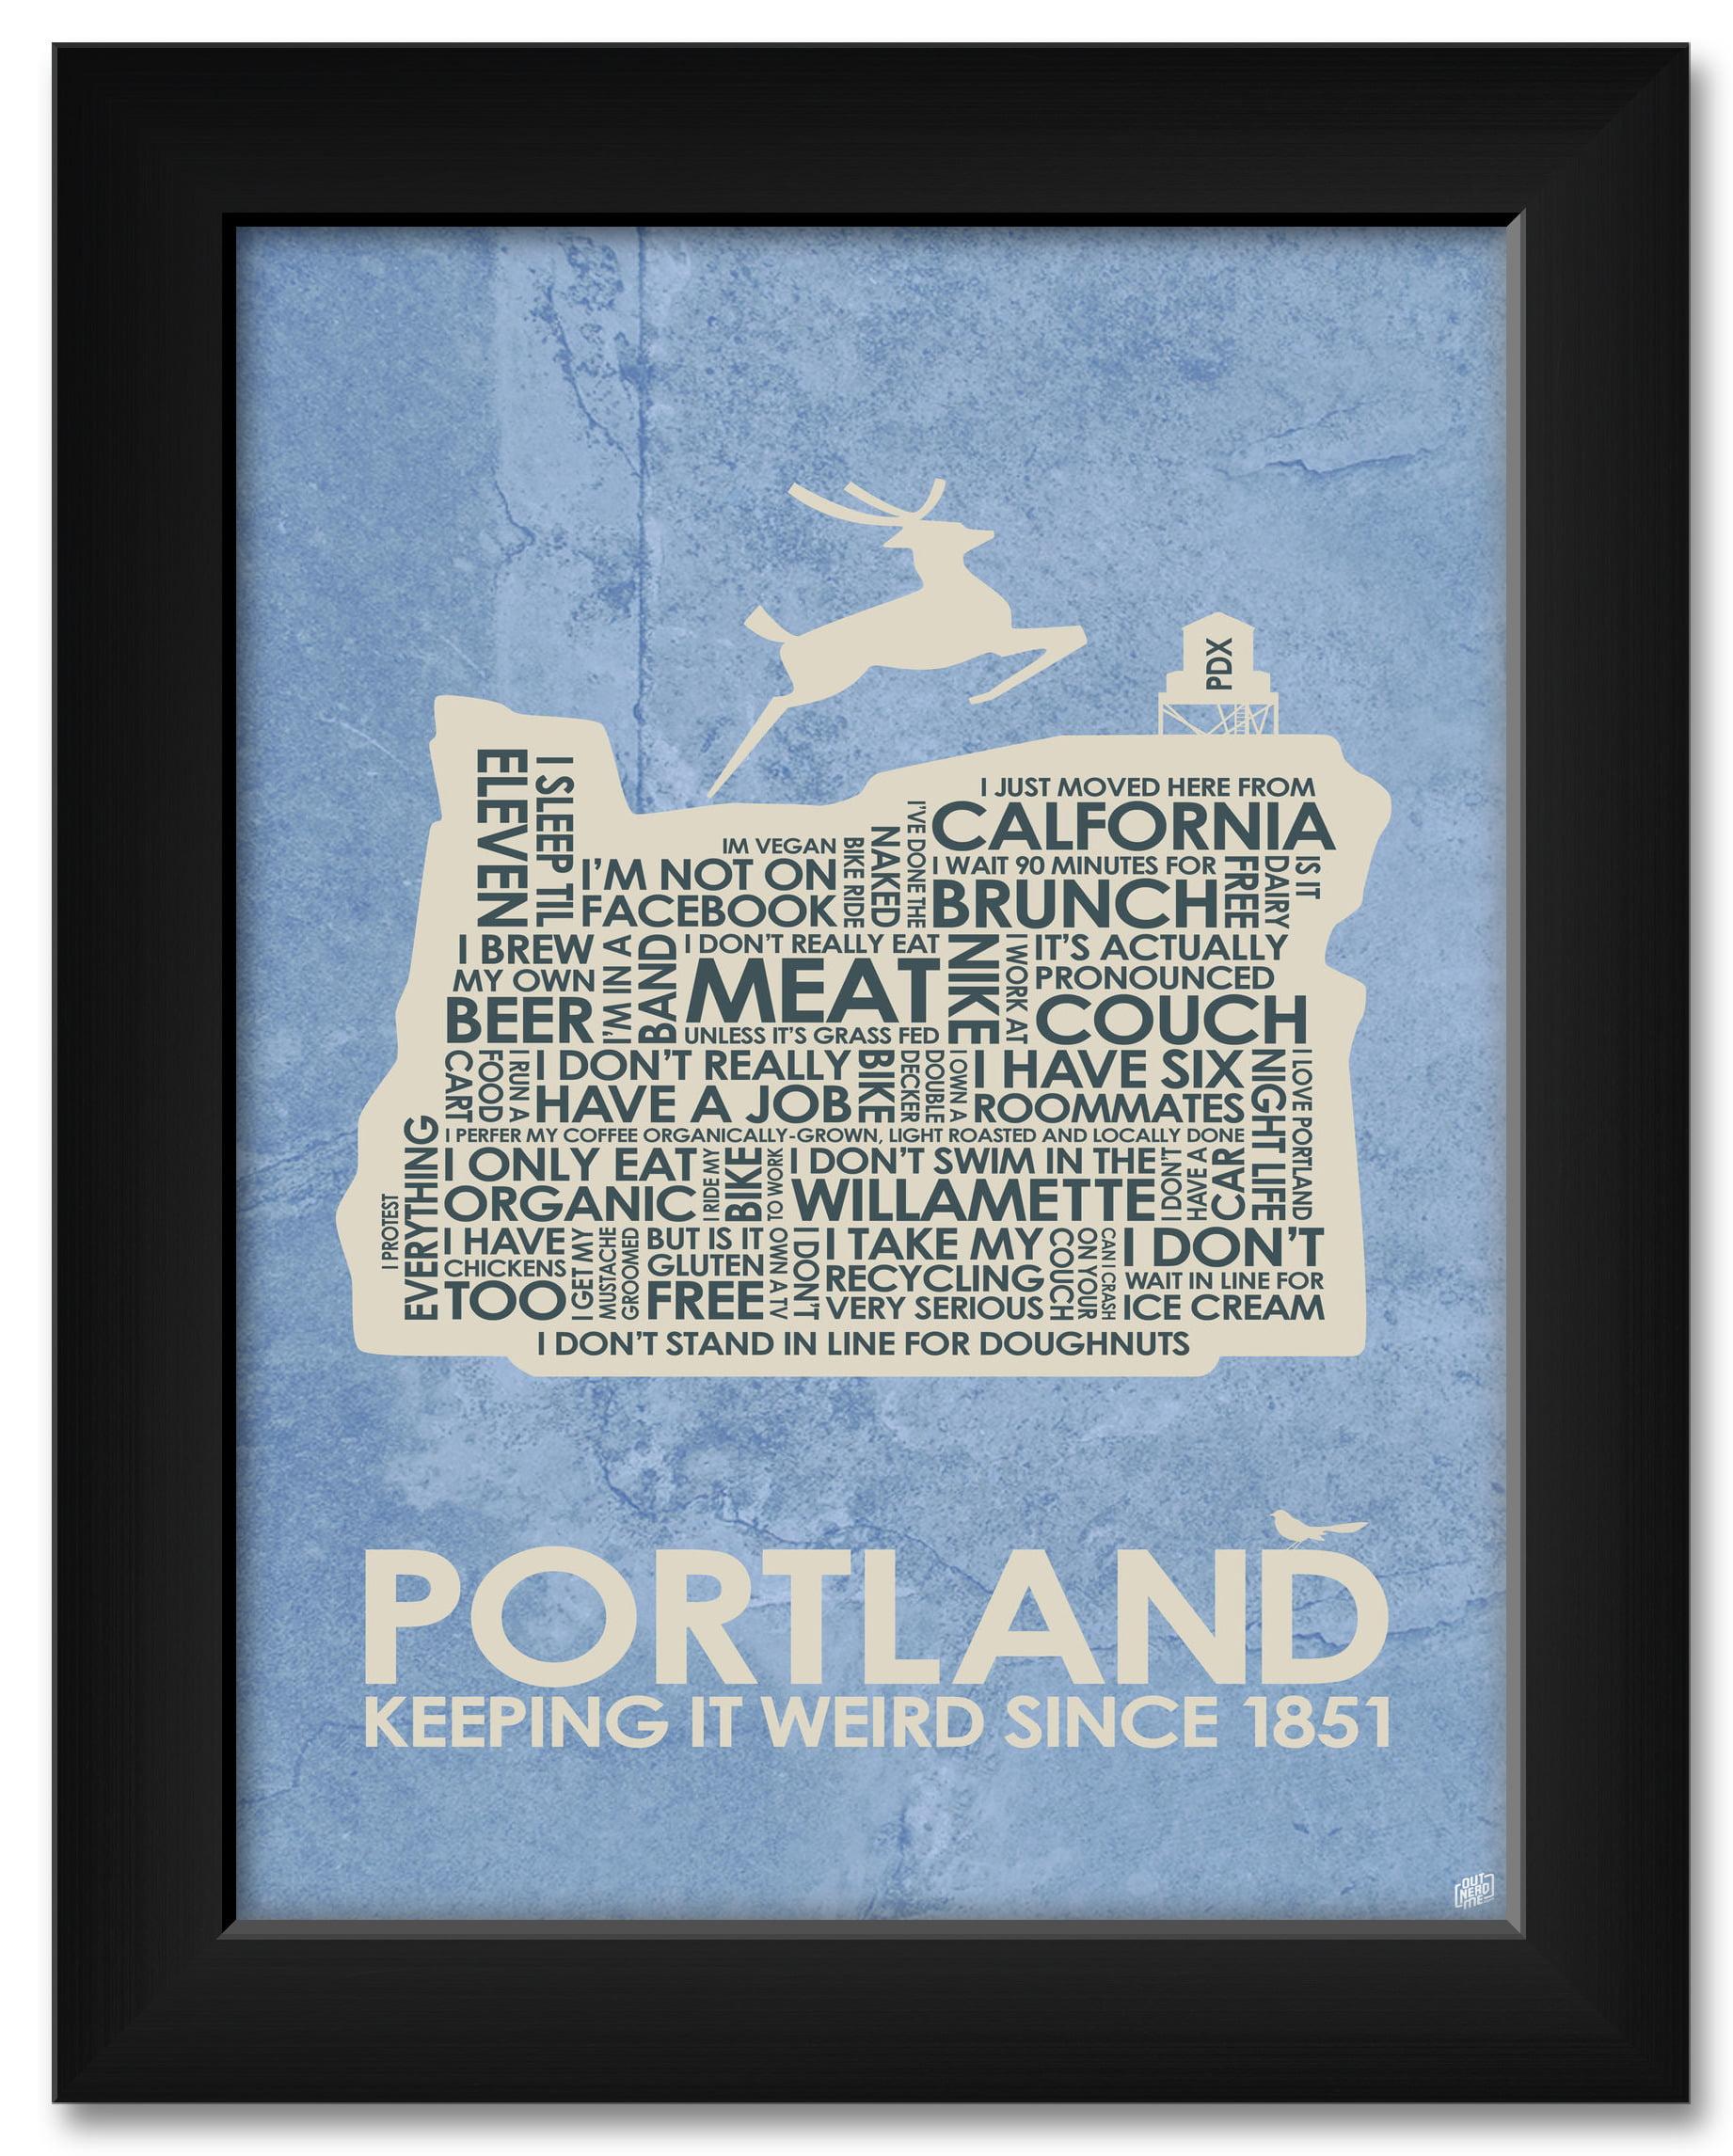 Portlandia, Portland, Oregon Sayings Framed Art Print by Stephen Poon   Print Size: 18